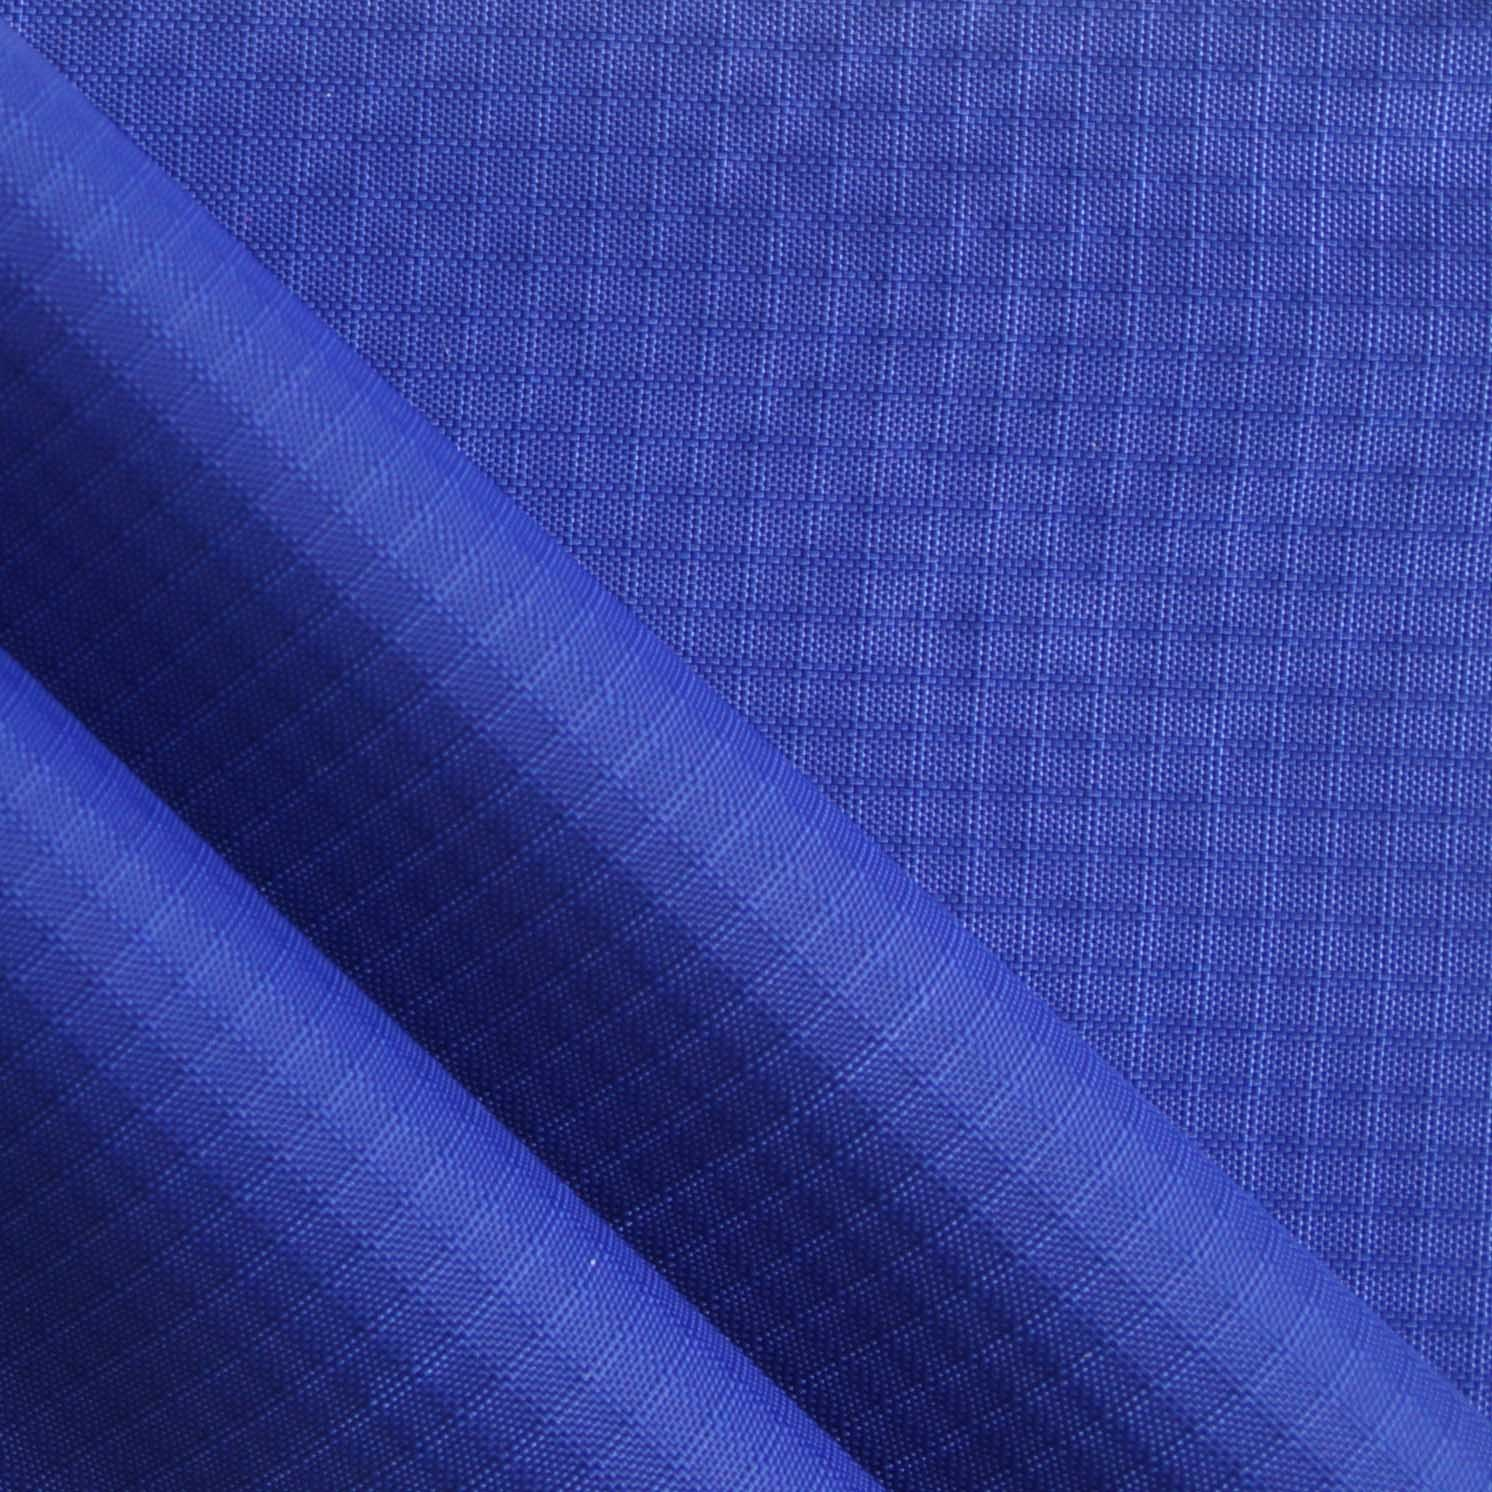 Waterproof Double-Yarn Ripstop Diamond Nylon Fabric with PU